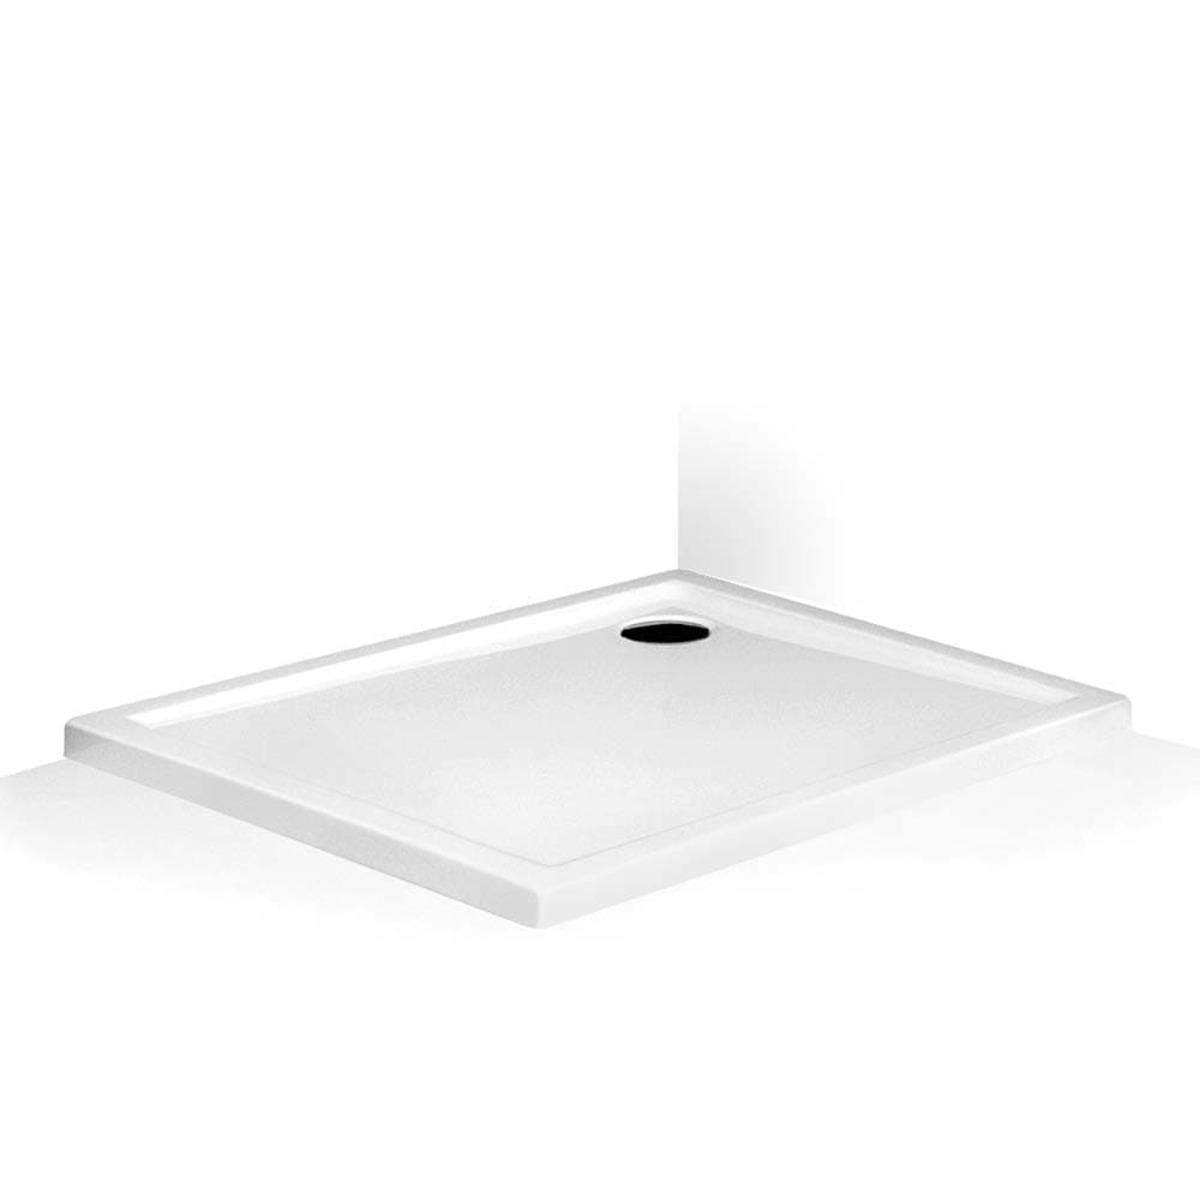 Sprchová vanička obdélníková Roth 110x90 cm akrylát 8000252